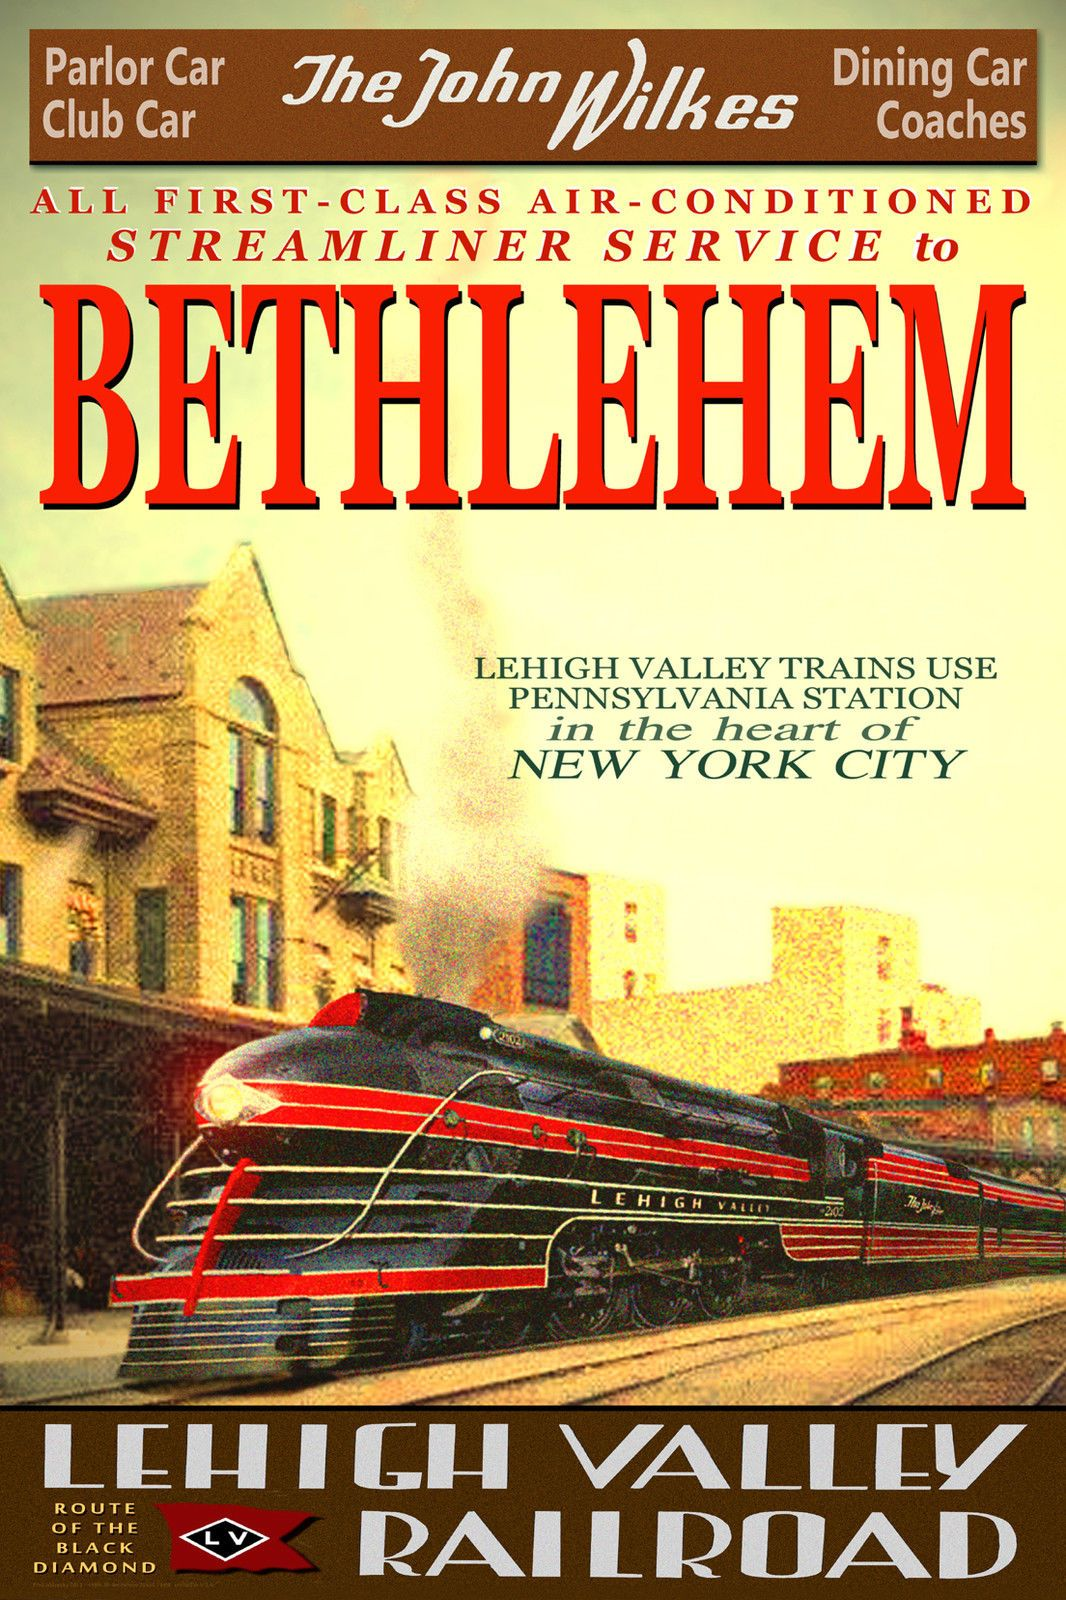 BETHLEHEM PA Lehigh Valley Railroad JOHN WILKES New Train Poster Art Print 124